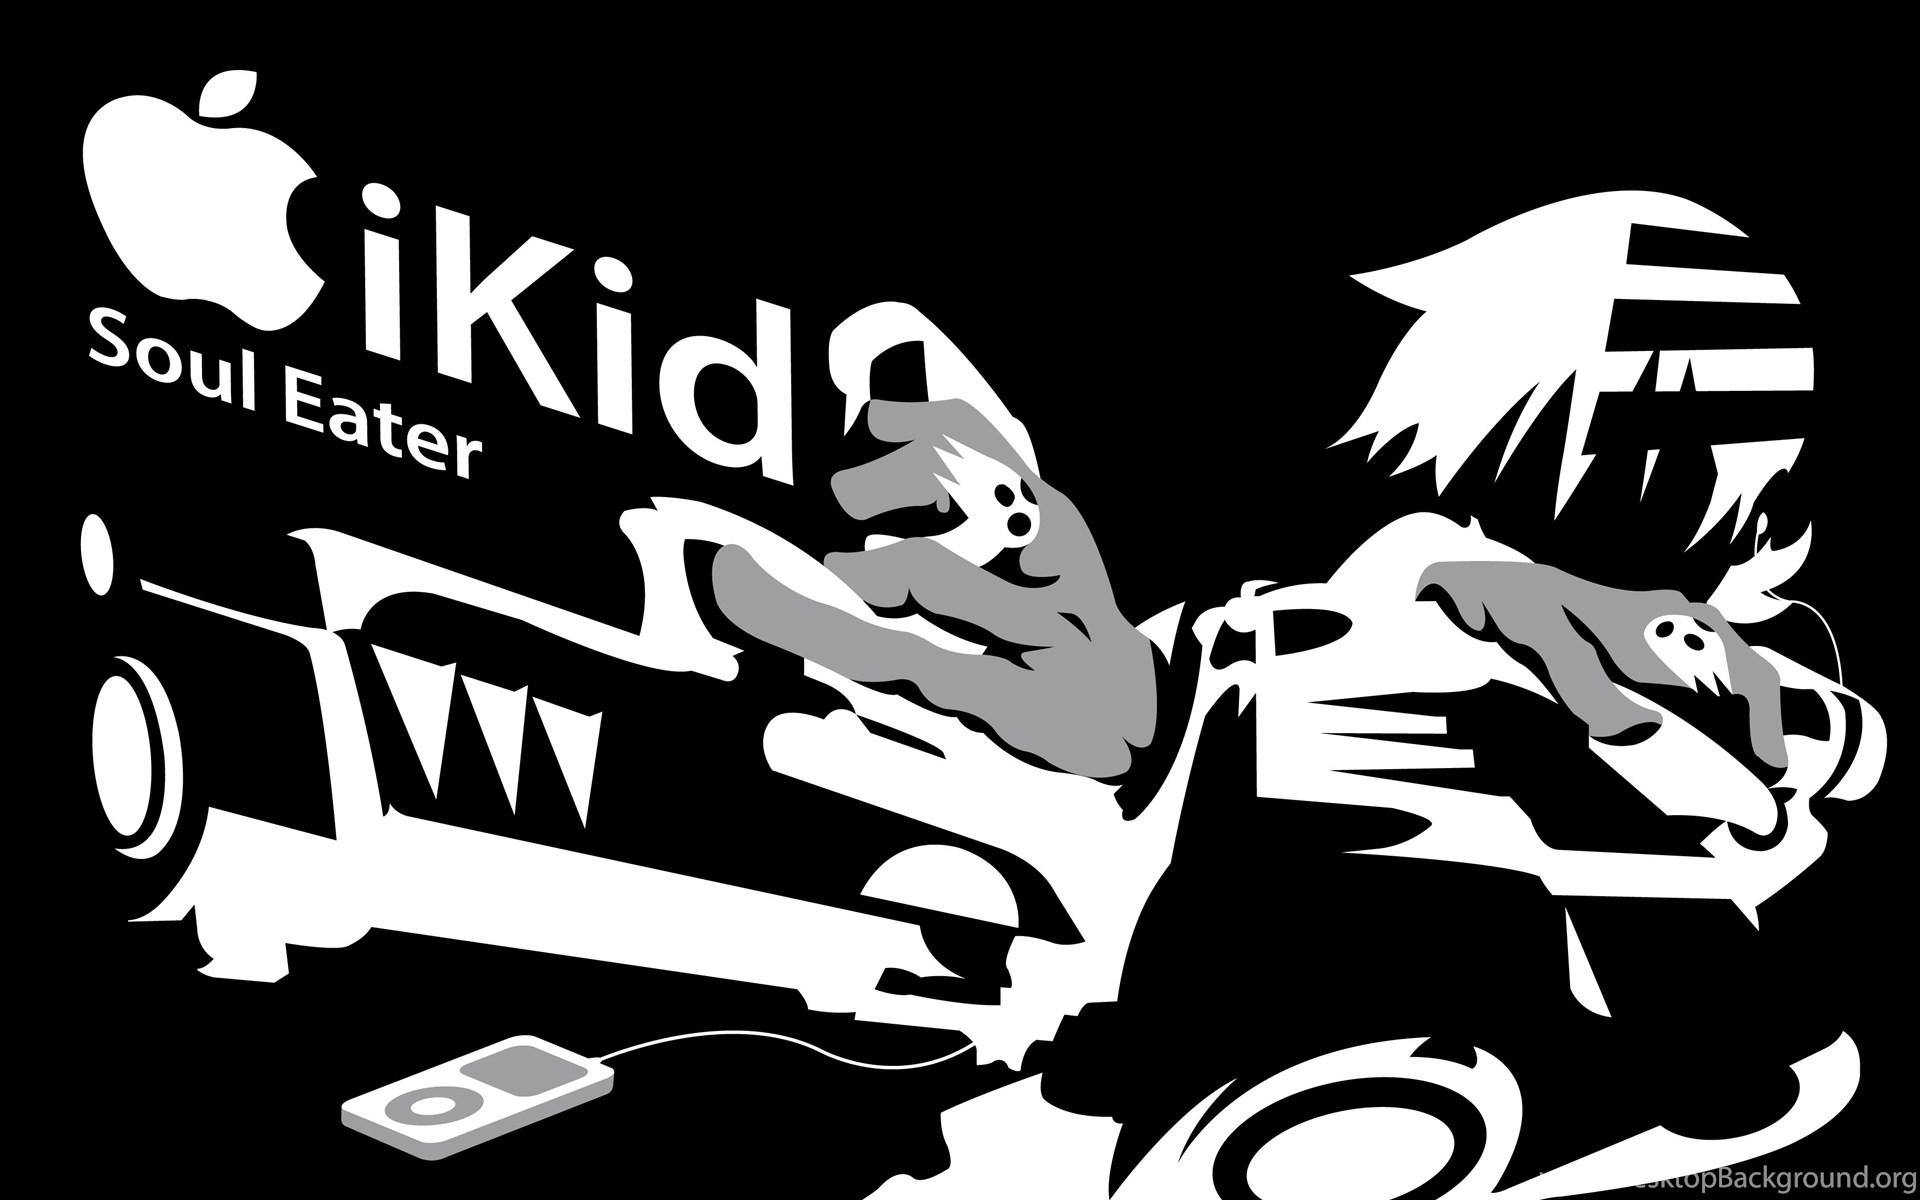 Soul Eater Death The Kid Wallpapers Desktop Background